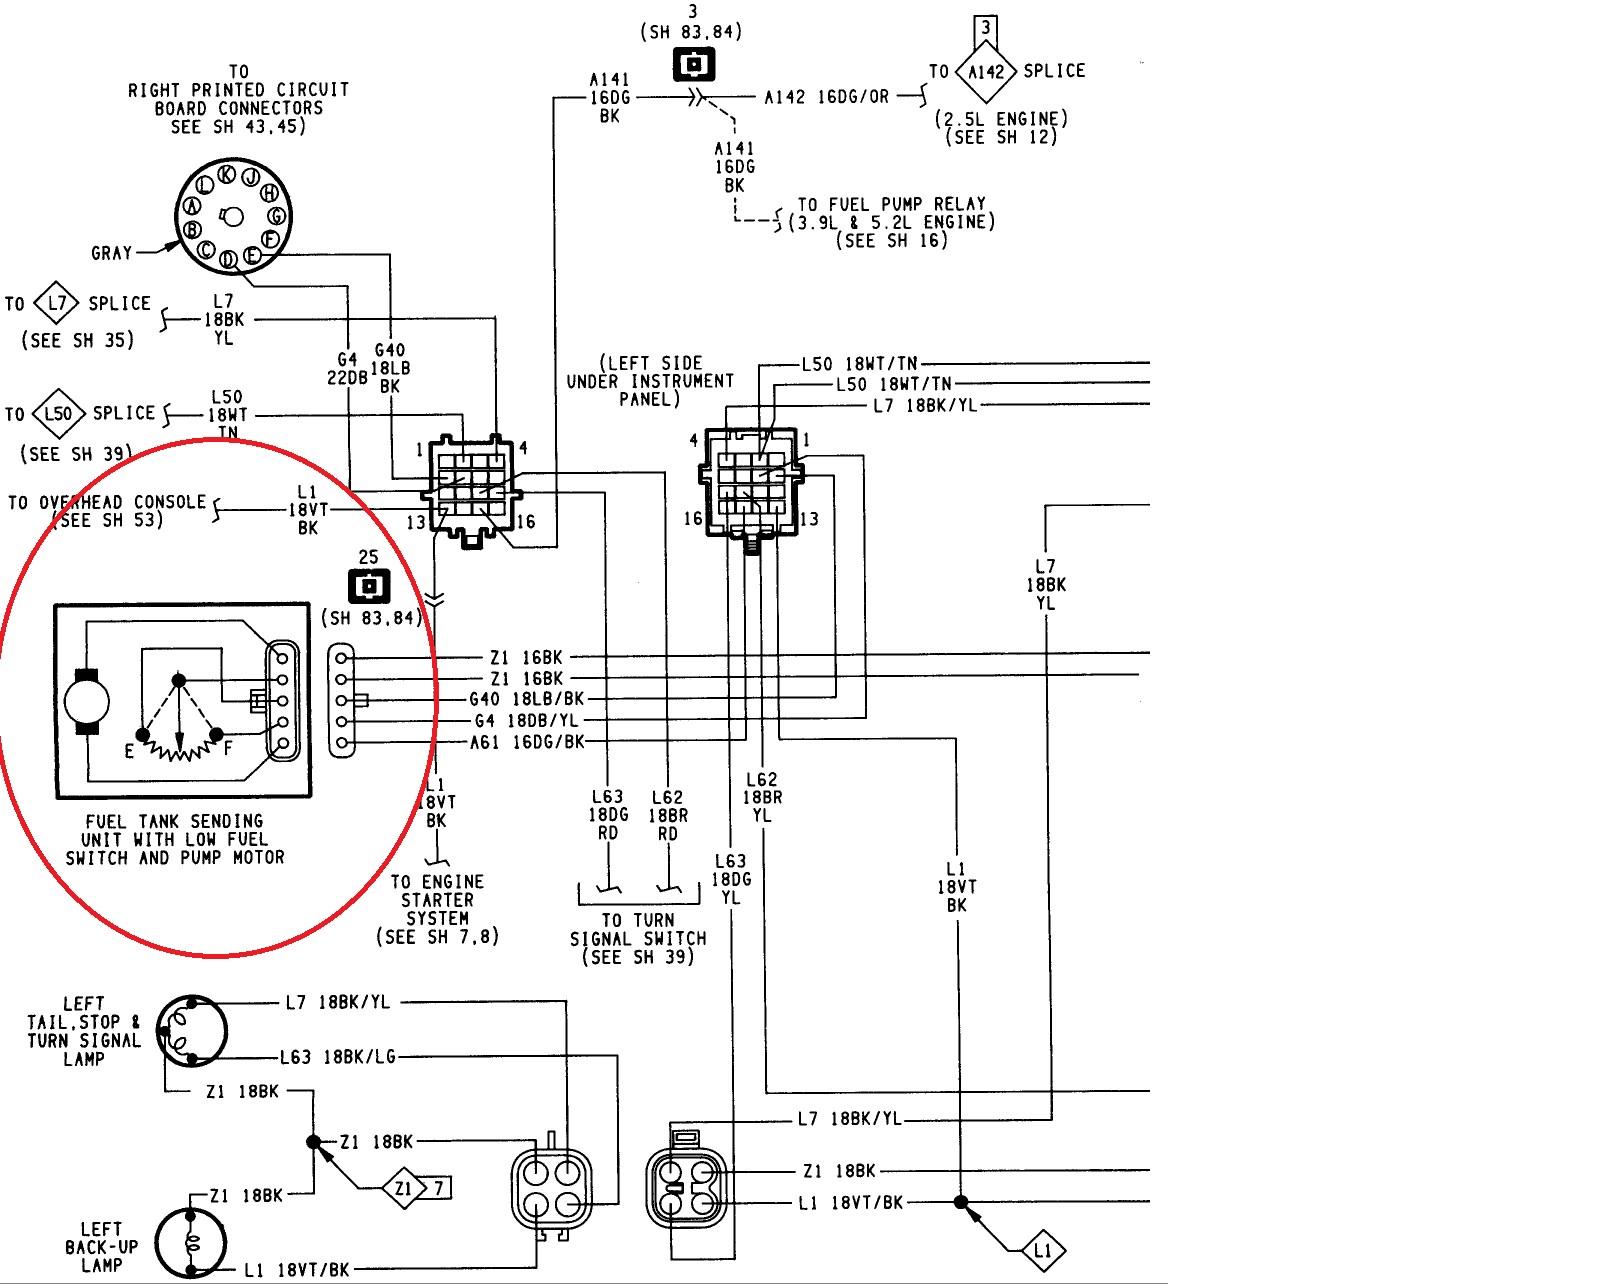 Diy Fuel Pump Gauge Trouble Shooting No Dial Up Friendly Dodge Dakota Wiring Diagram